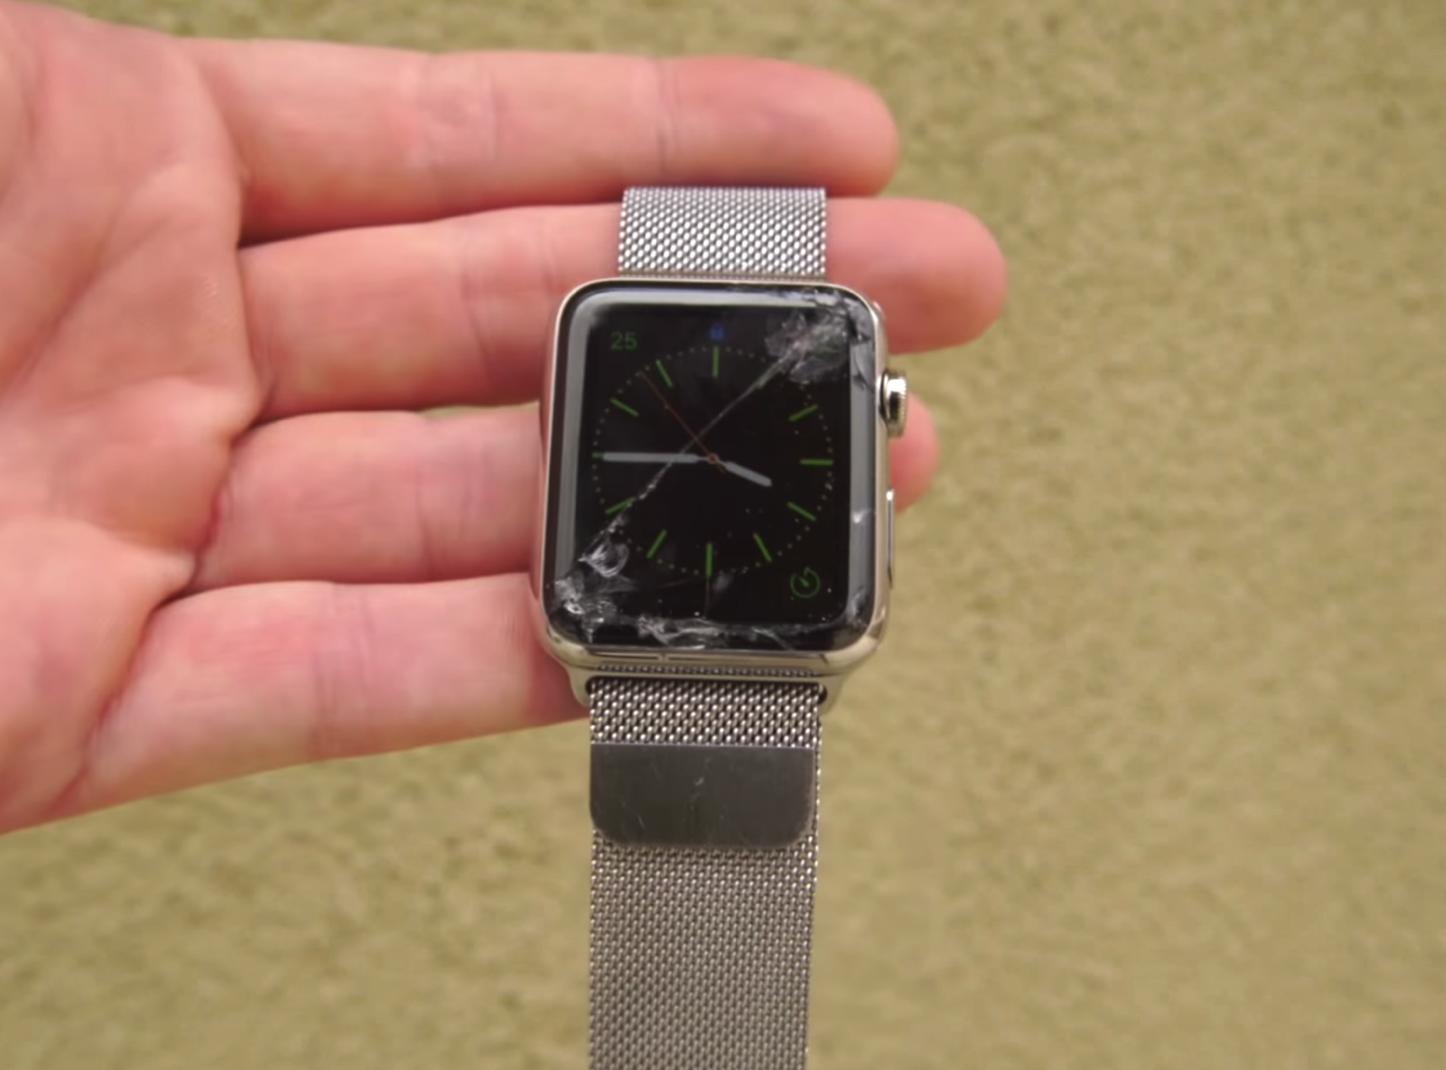 Apple Watch Display Crack 1